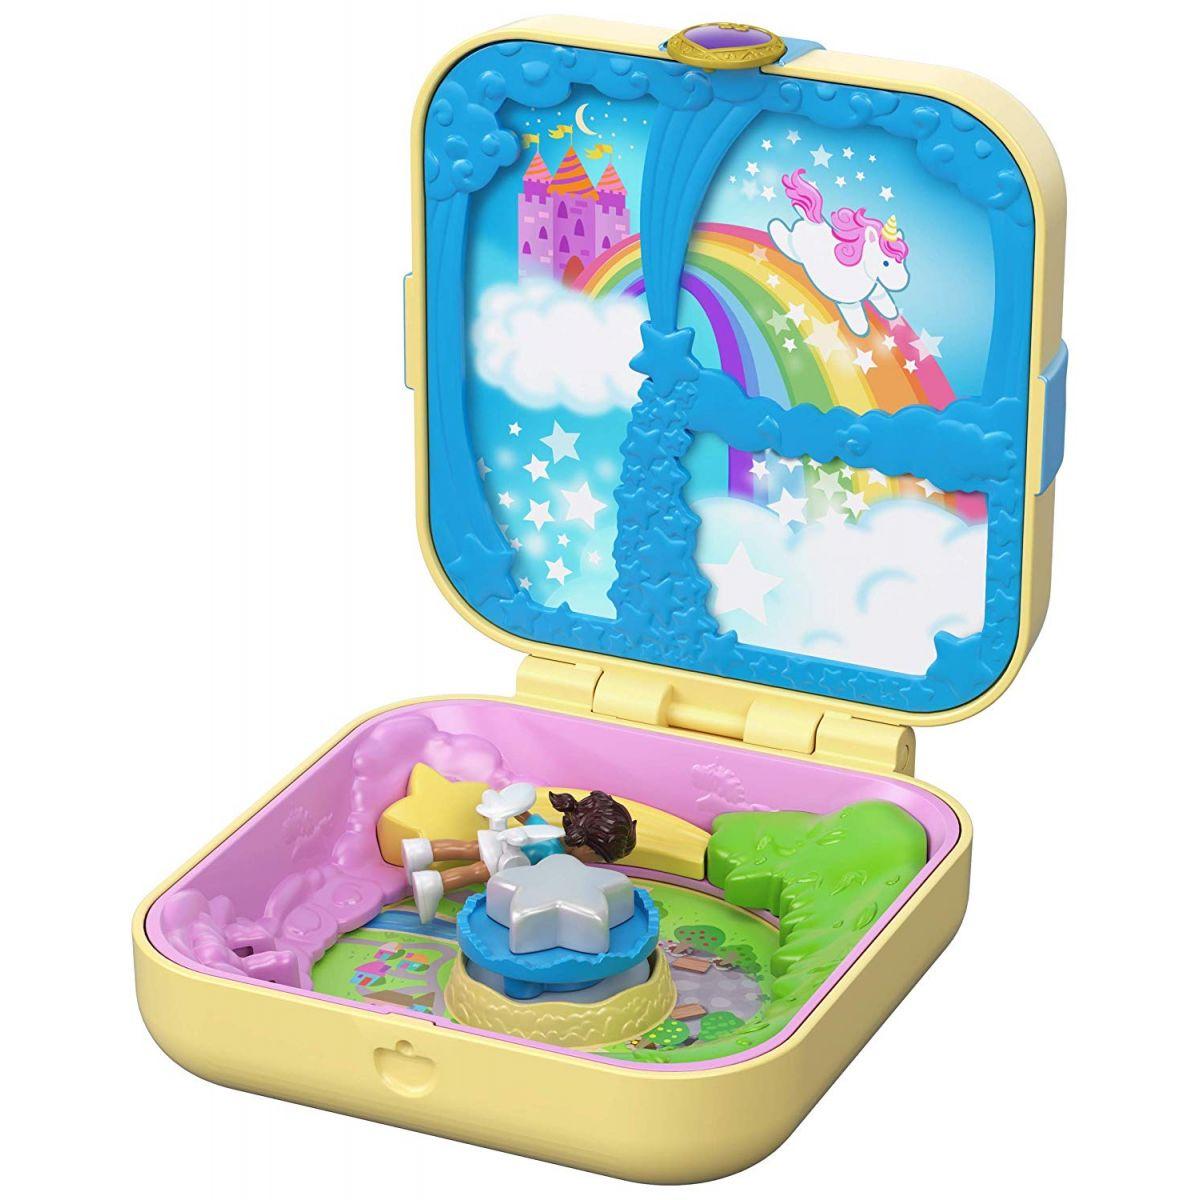 Mattel Polly Pocket pidi svet v krabičke Unicorn Utopia